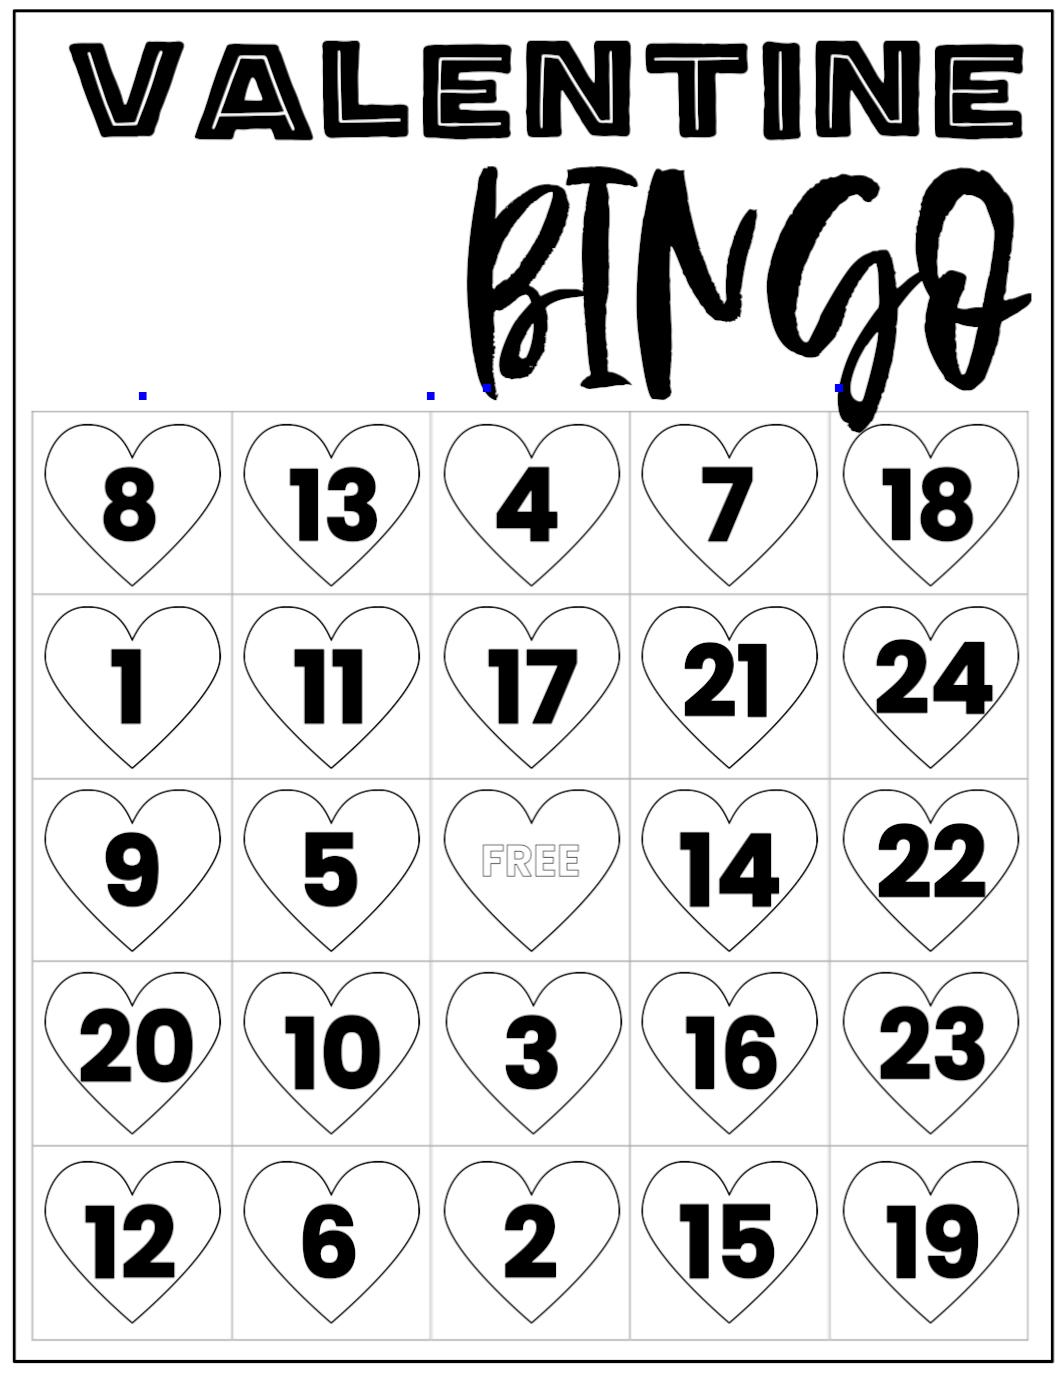 Free Valentine Bingo Printable Cards